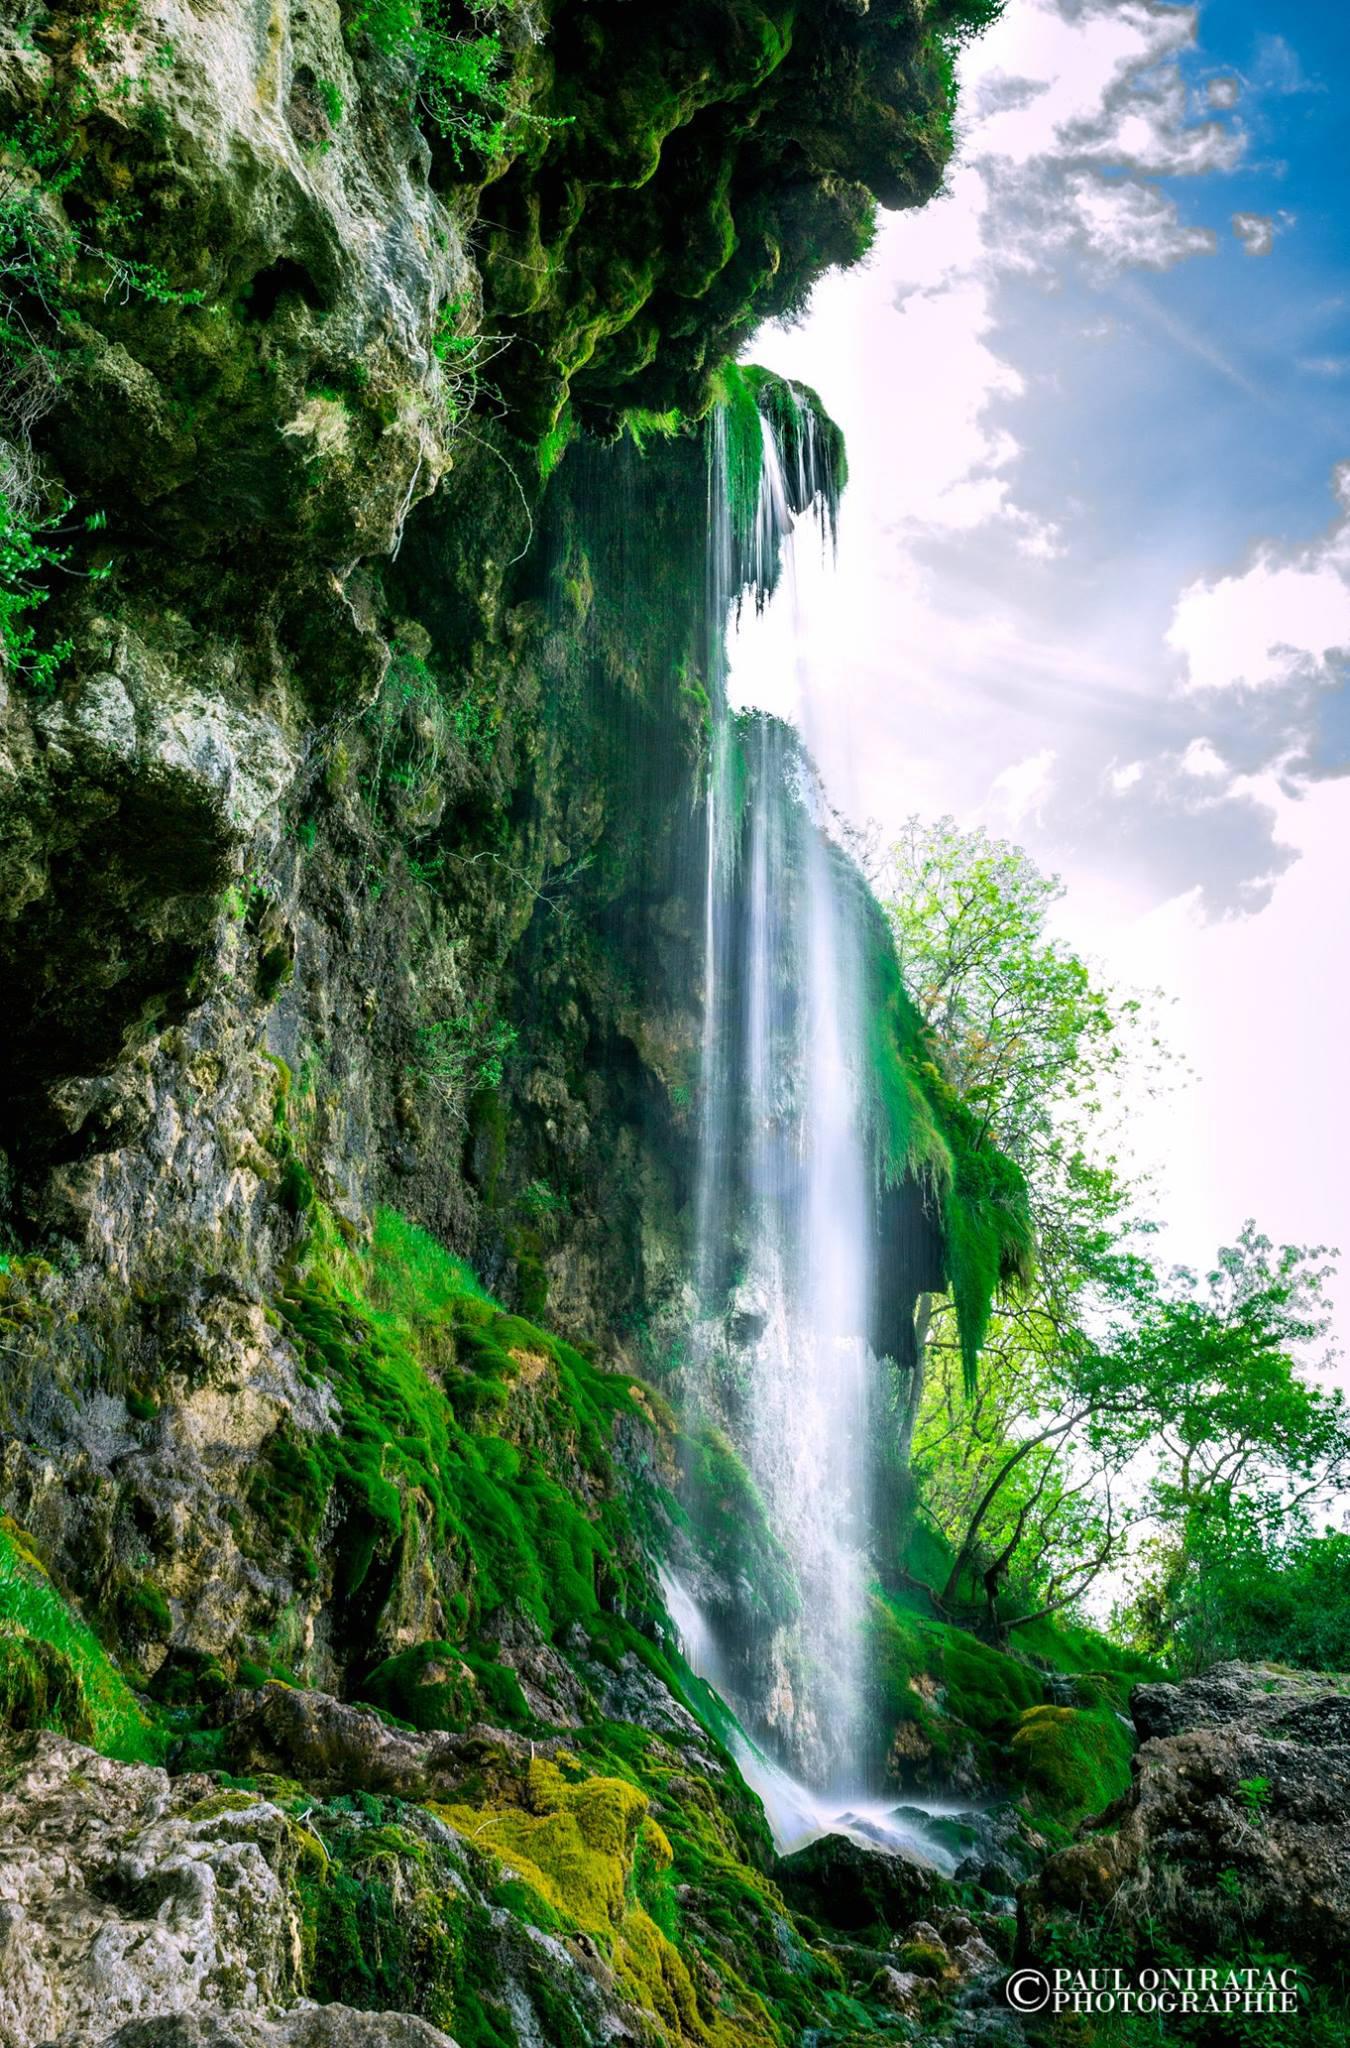 Cascade à Creissels, Aveyron © P. Oniratac